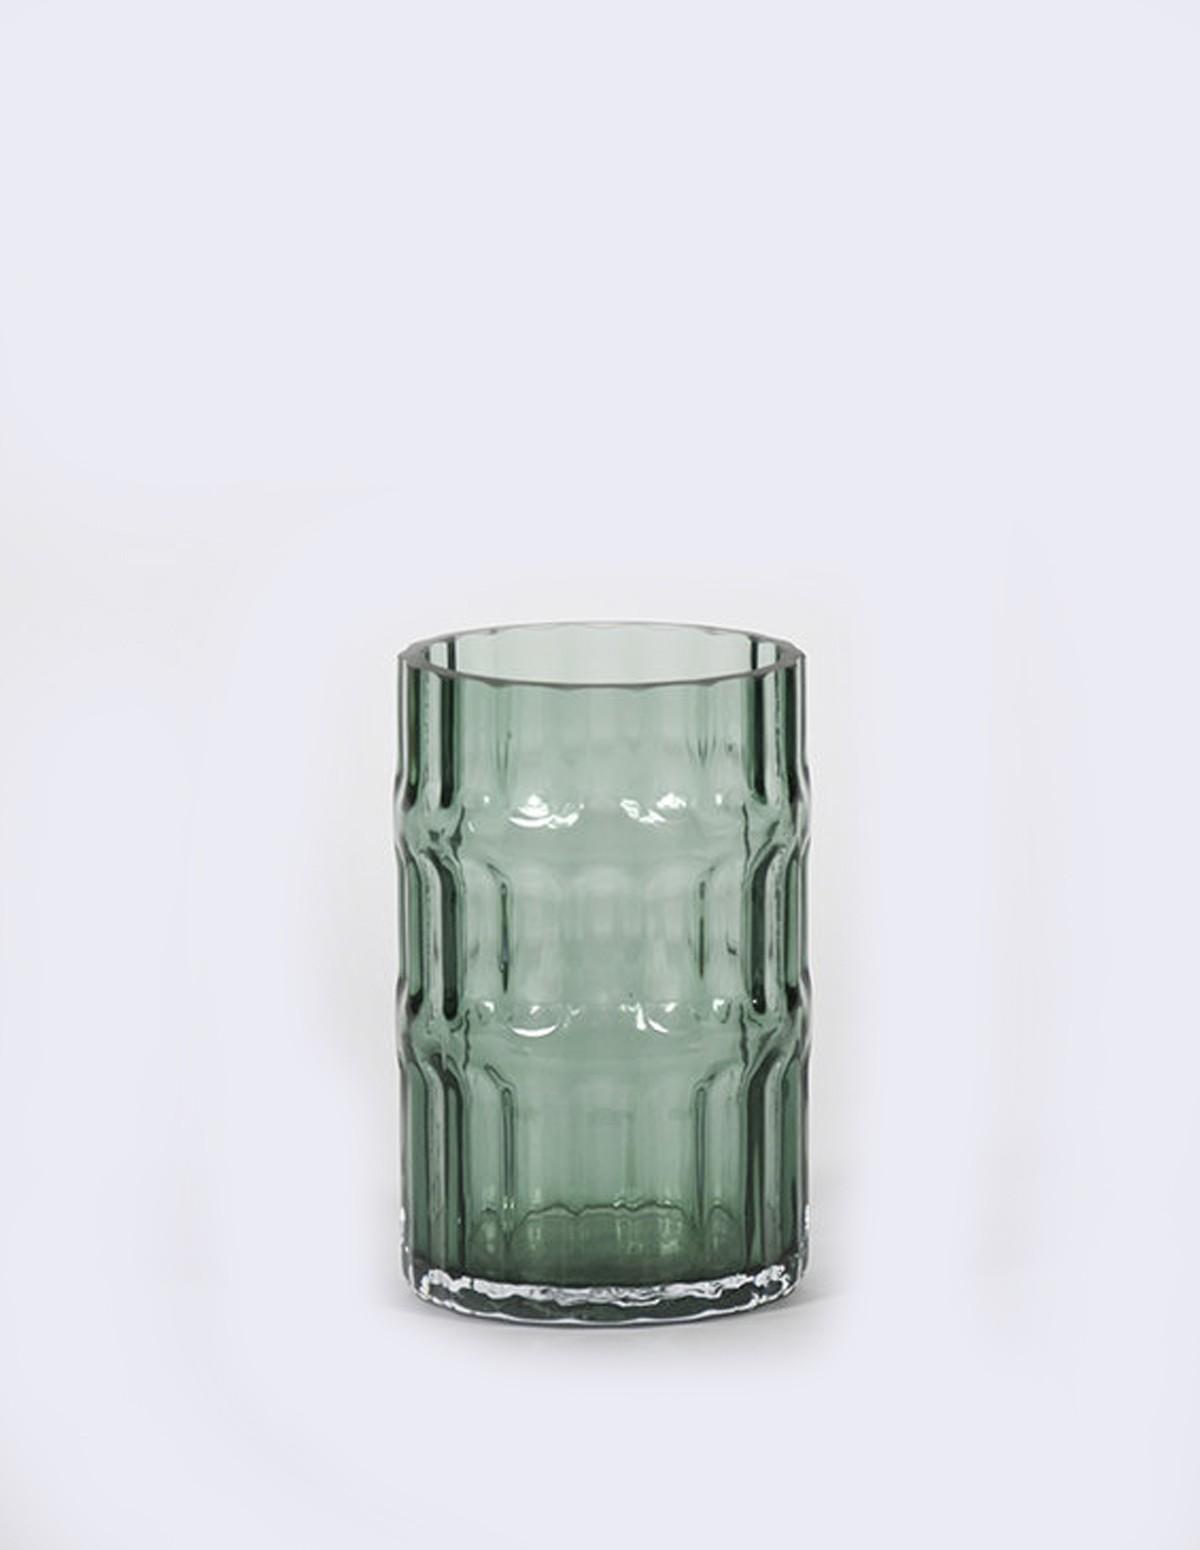 Eno Studio Ondin Small Vase - VERT